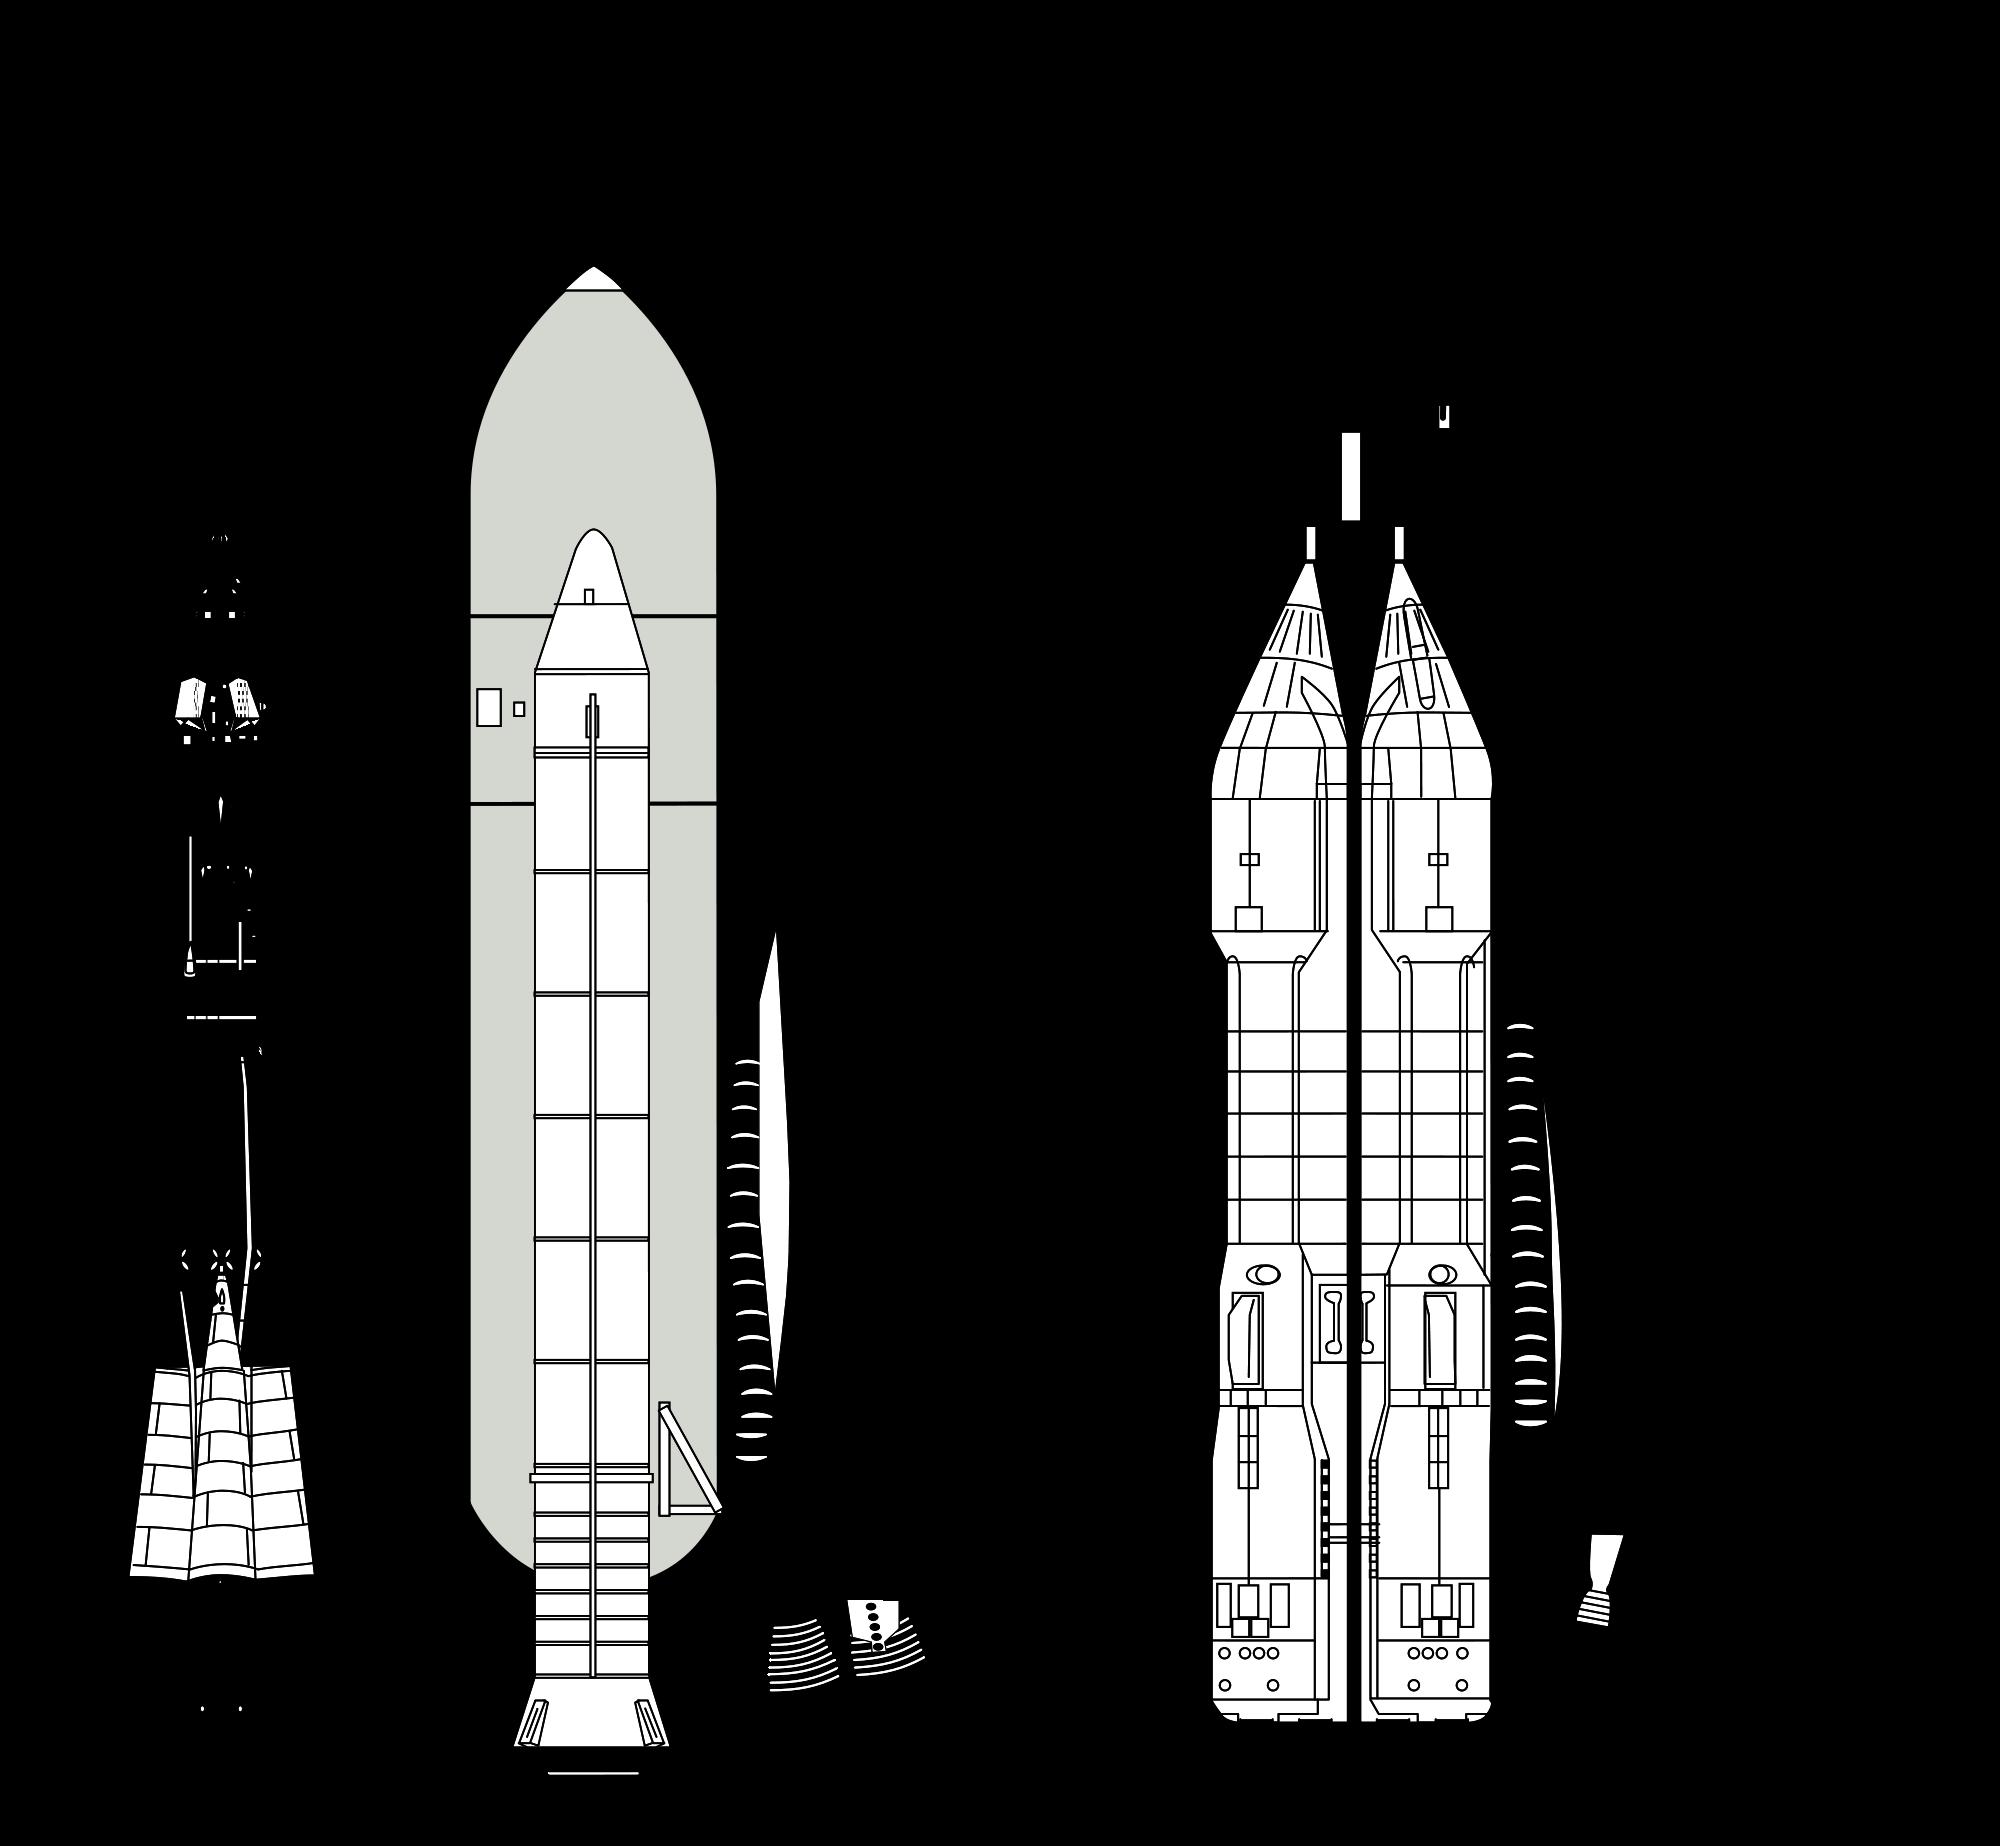 Soyuz Launch Vehicle The American Shuttle Transport